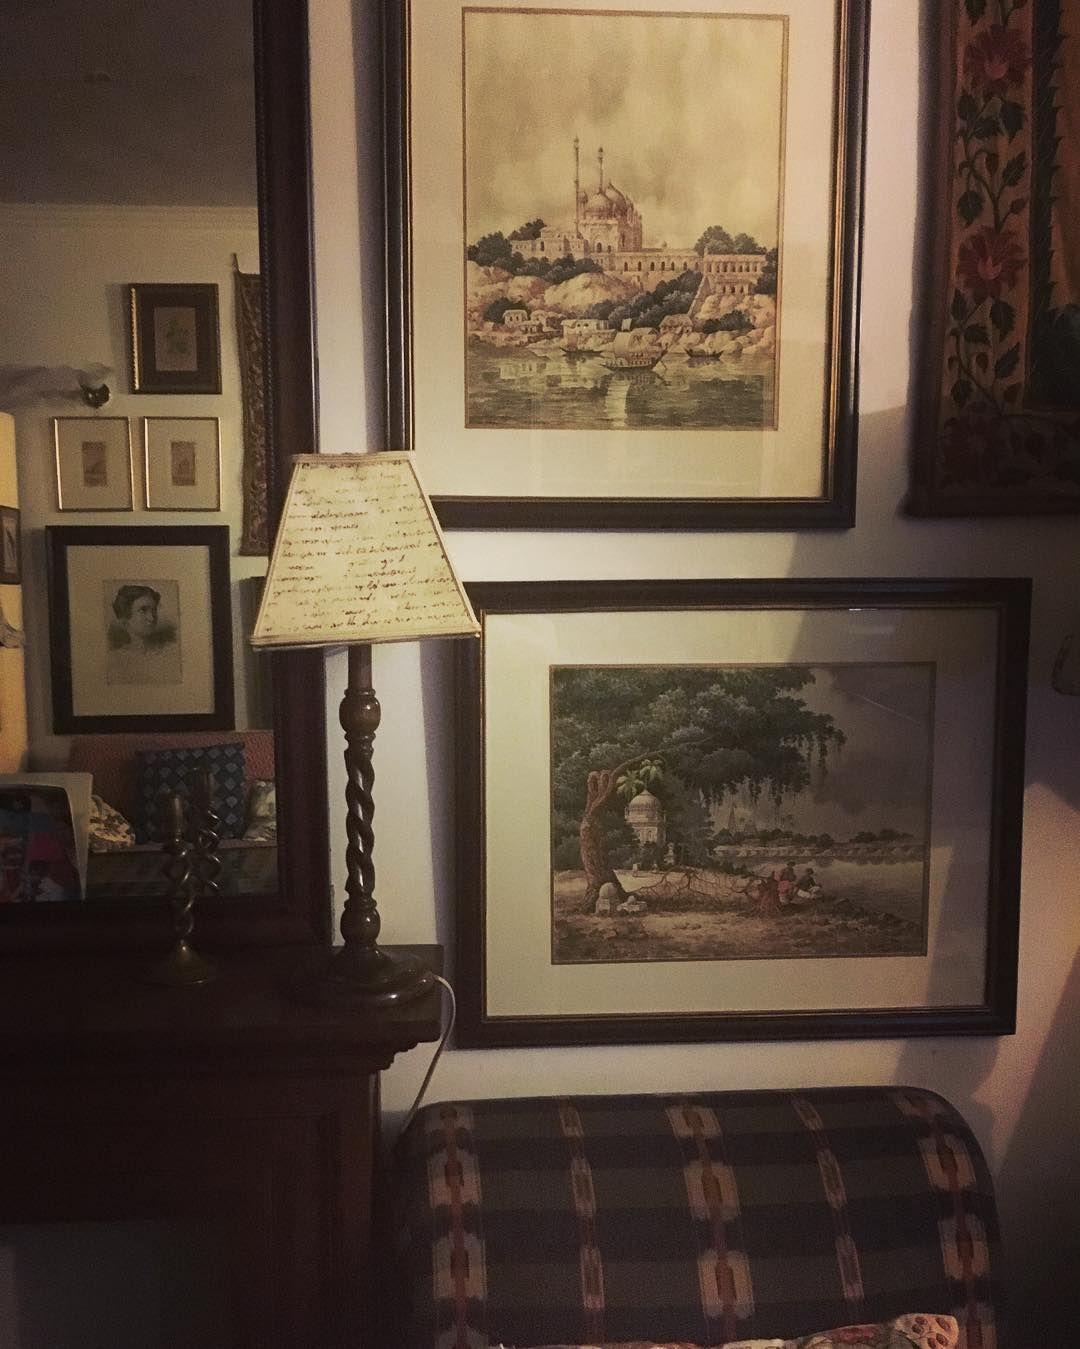 Delhi drawing room detail. Evening shadows creeping in..... #christophermoorefabrics